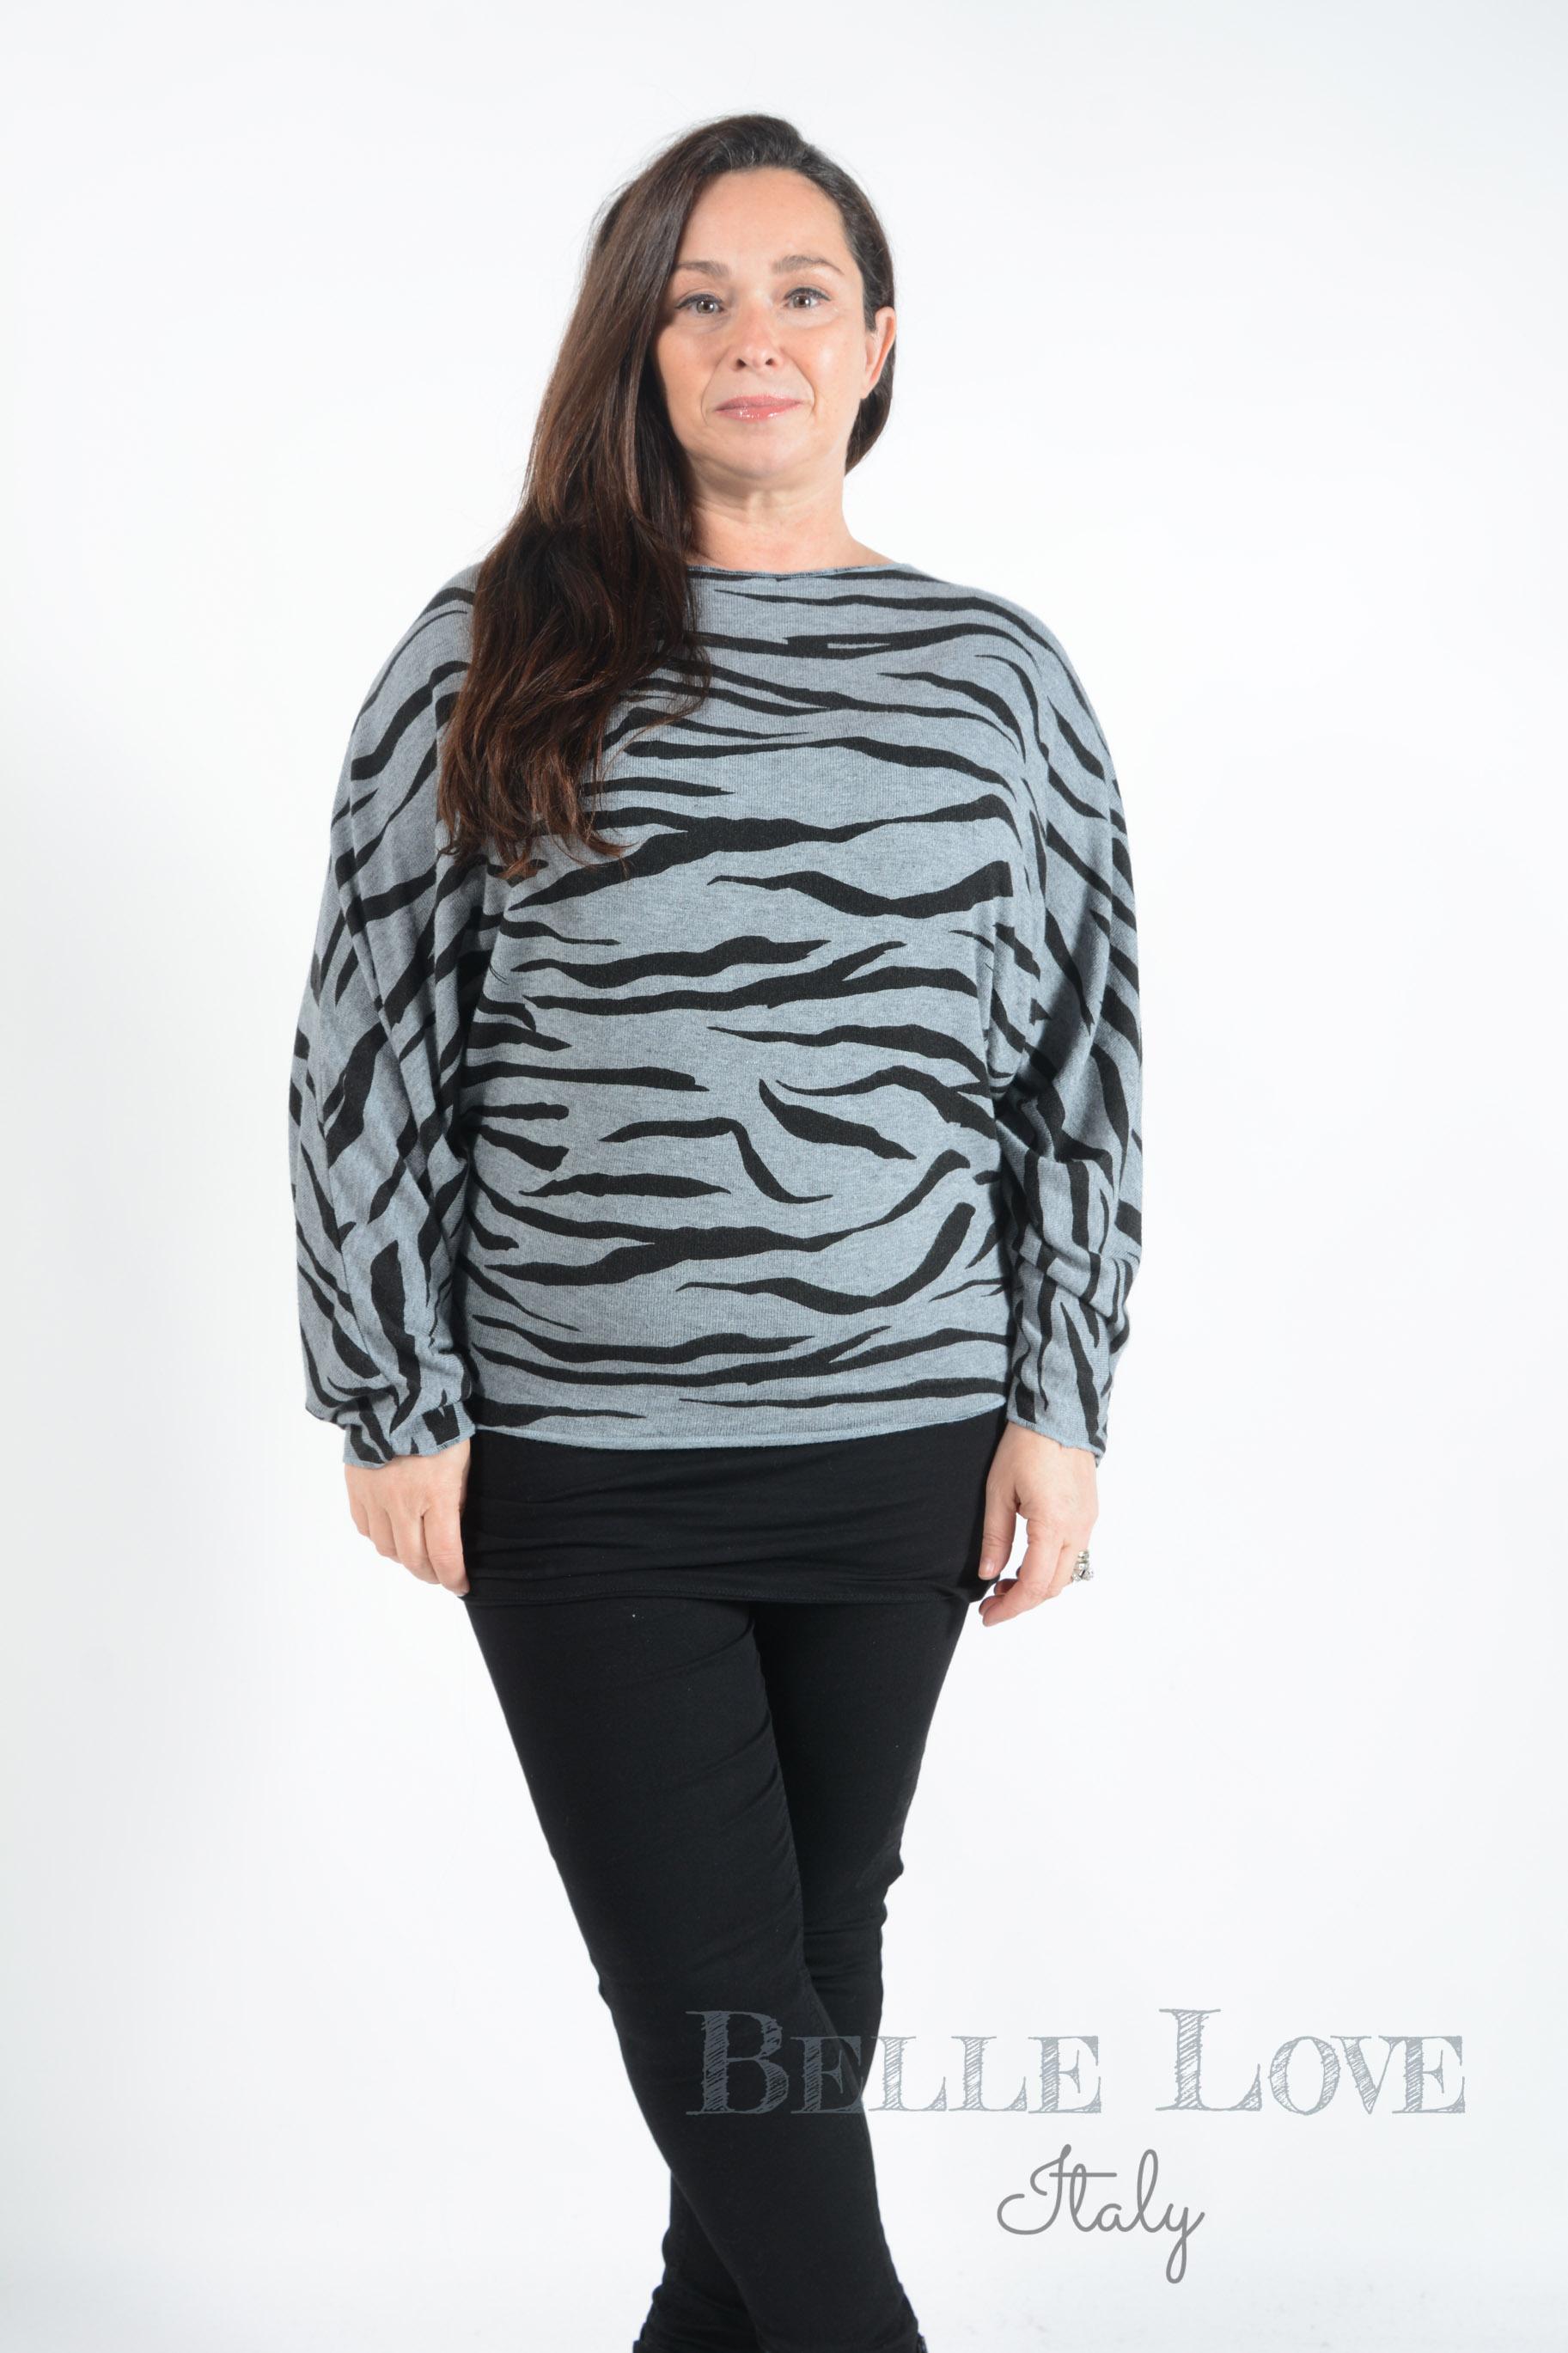 Belle Love Italy Valentina Zebra Print Knitwear